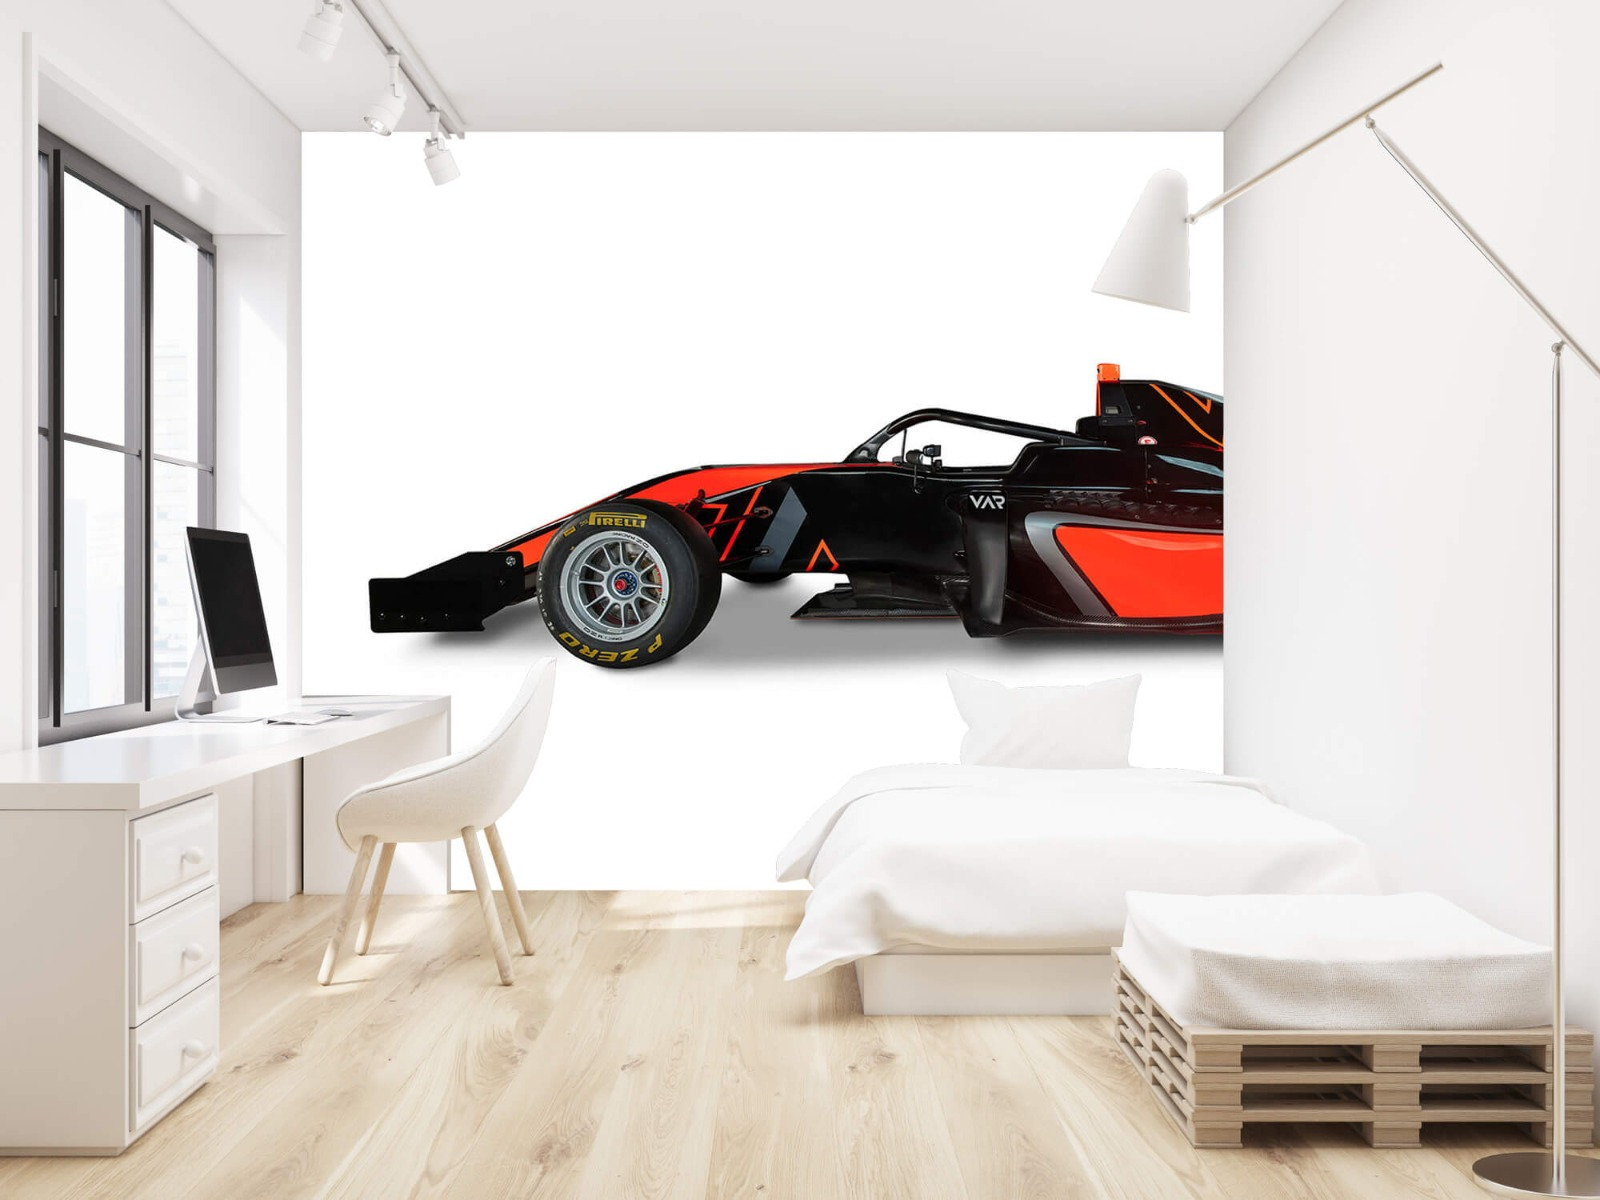 Sportauto's - Formule 3 - Lower side view - Computerruimte 22